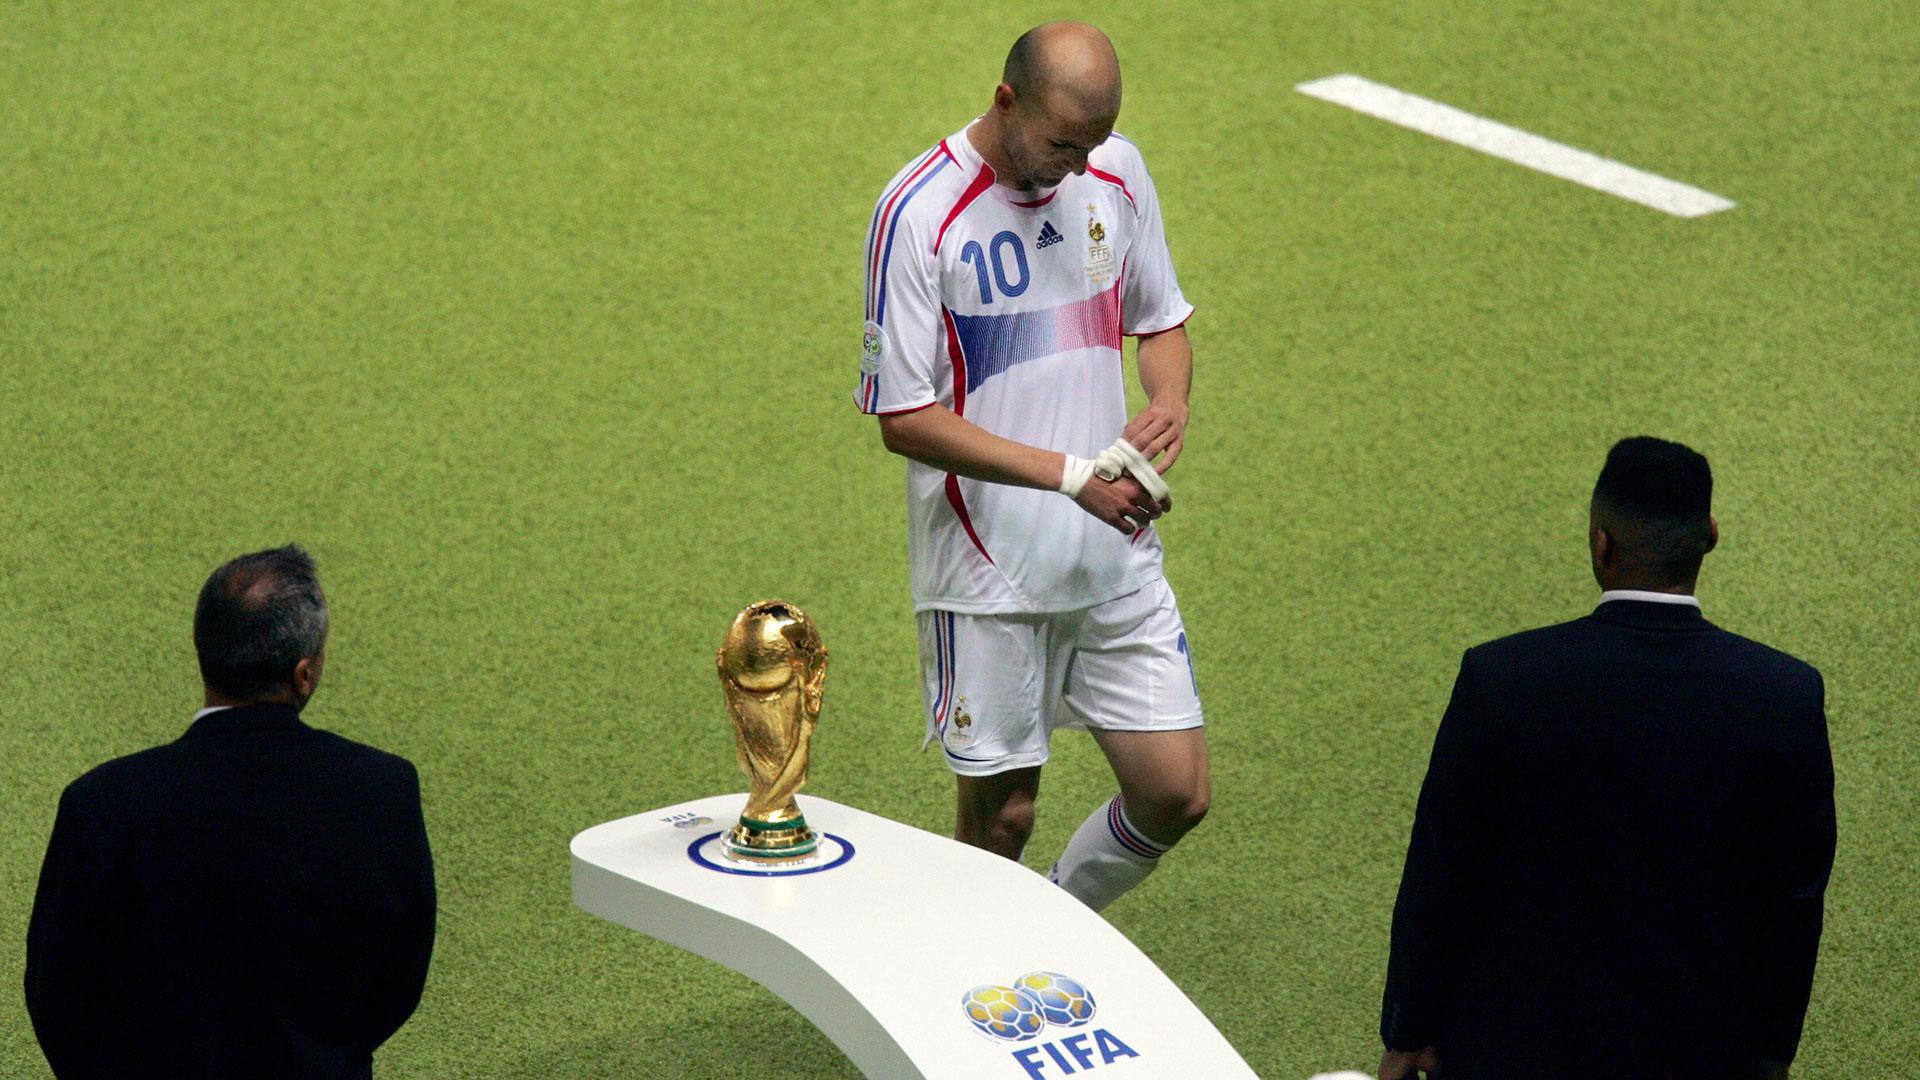 Zinedine Zidane France Italy 2006 World Cup final - Goal.com 96e7b6073